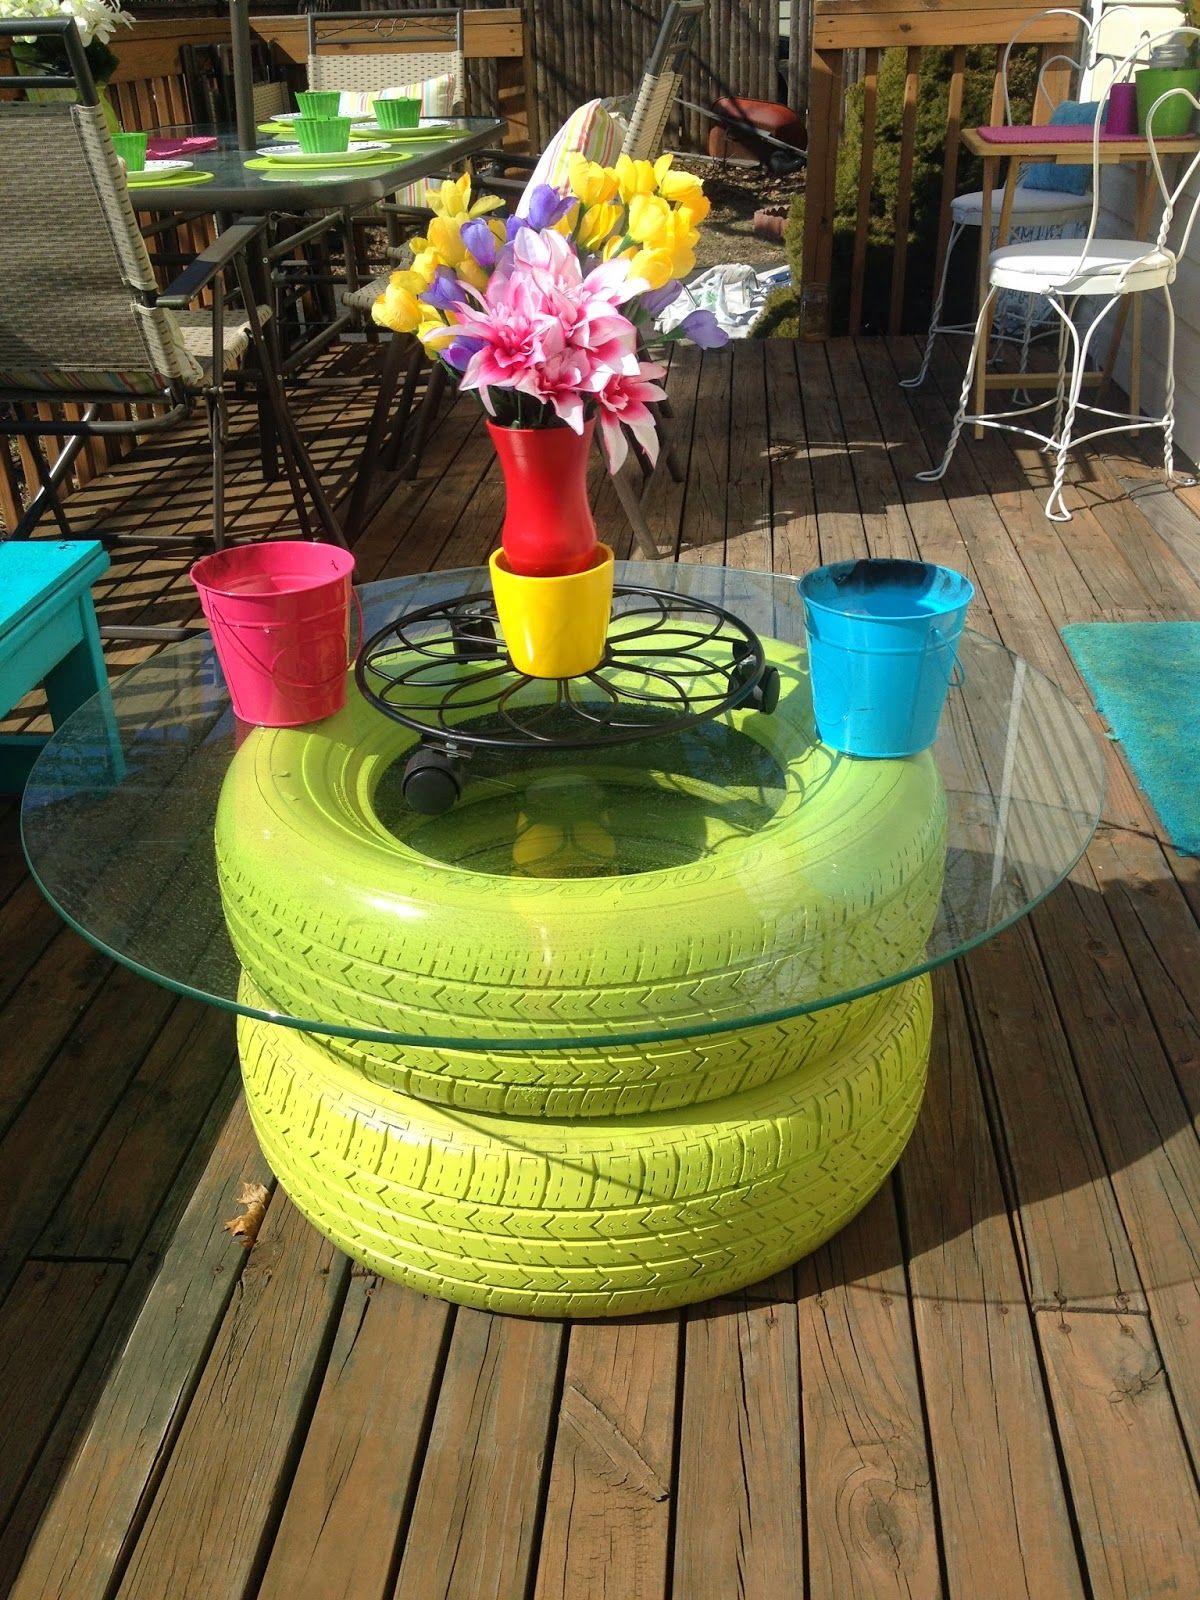 Tavolo Esterno Fai Da Te a colorful deck seating area makeover: bring on the spring